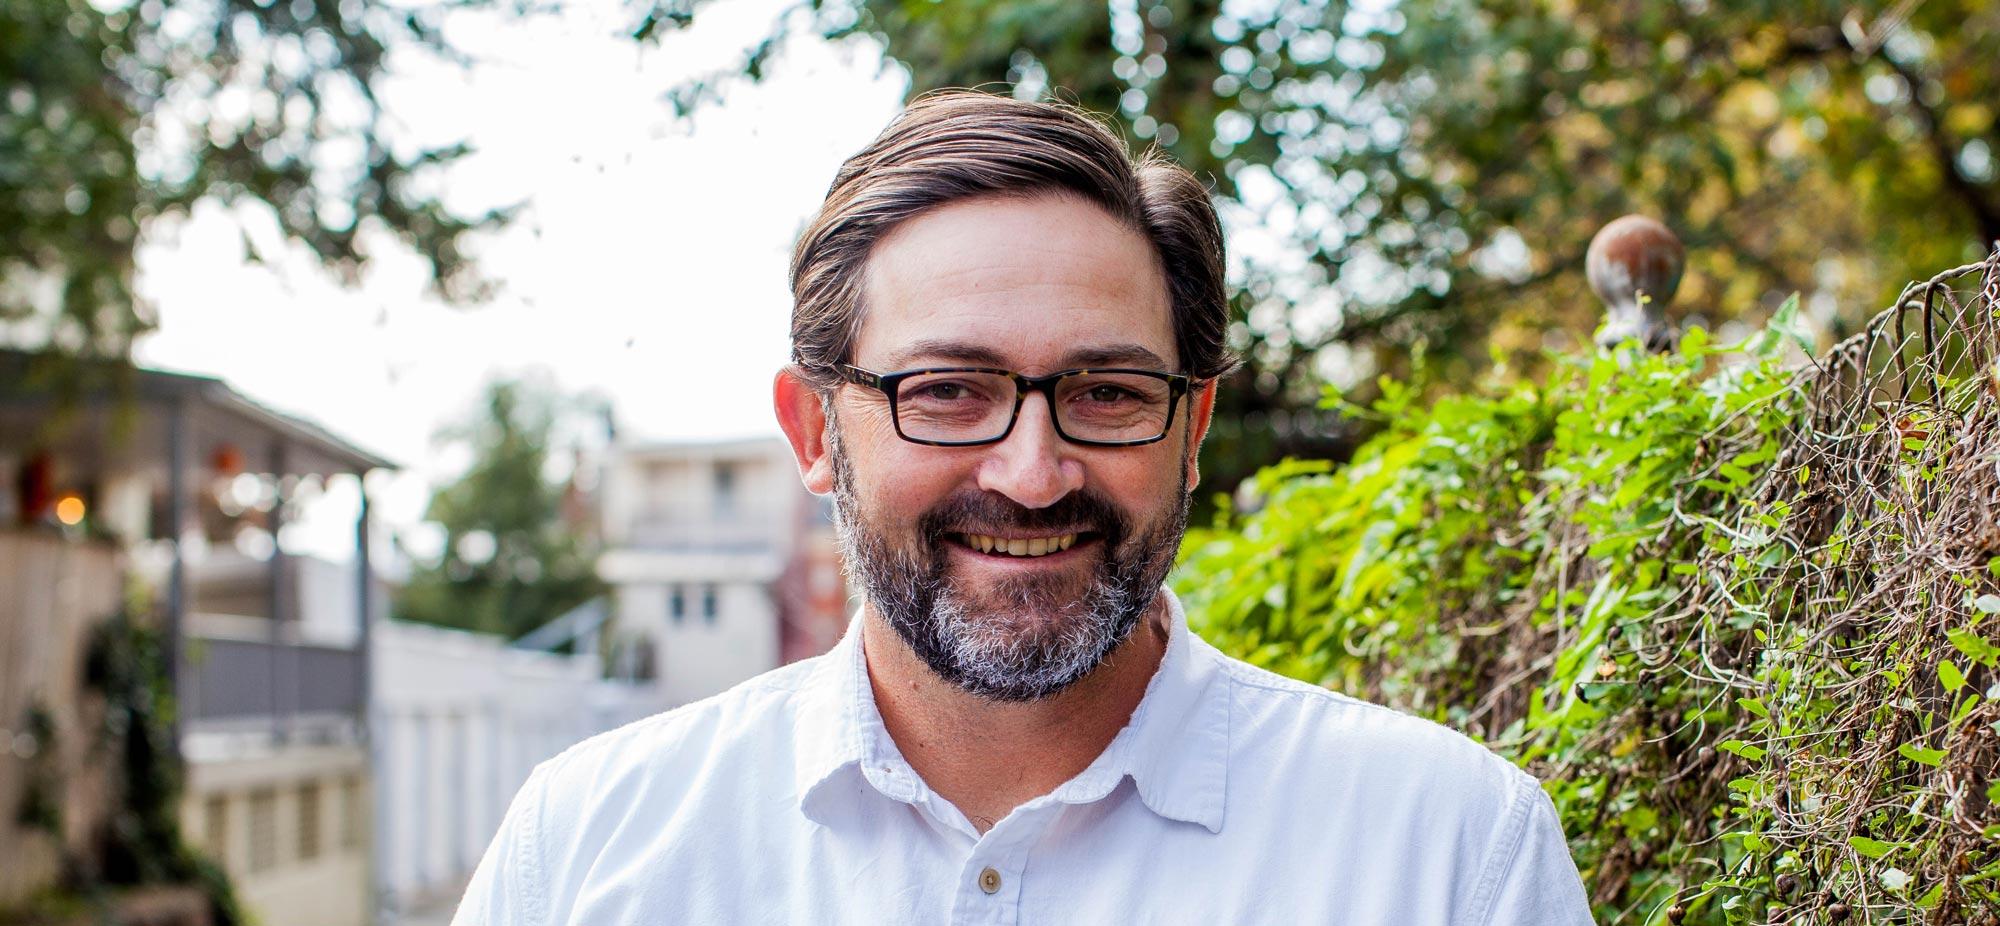 Steve Surdez, Senior Content Writer, Illumine8 Marketing and PR